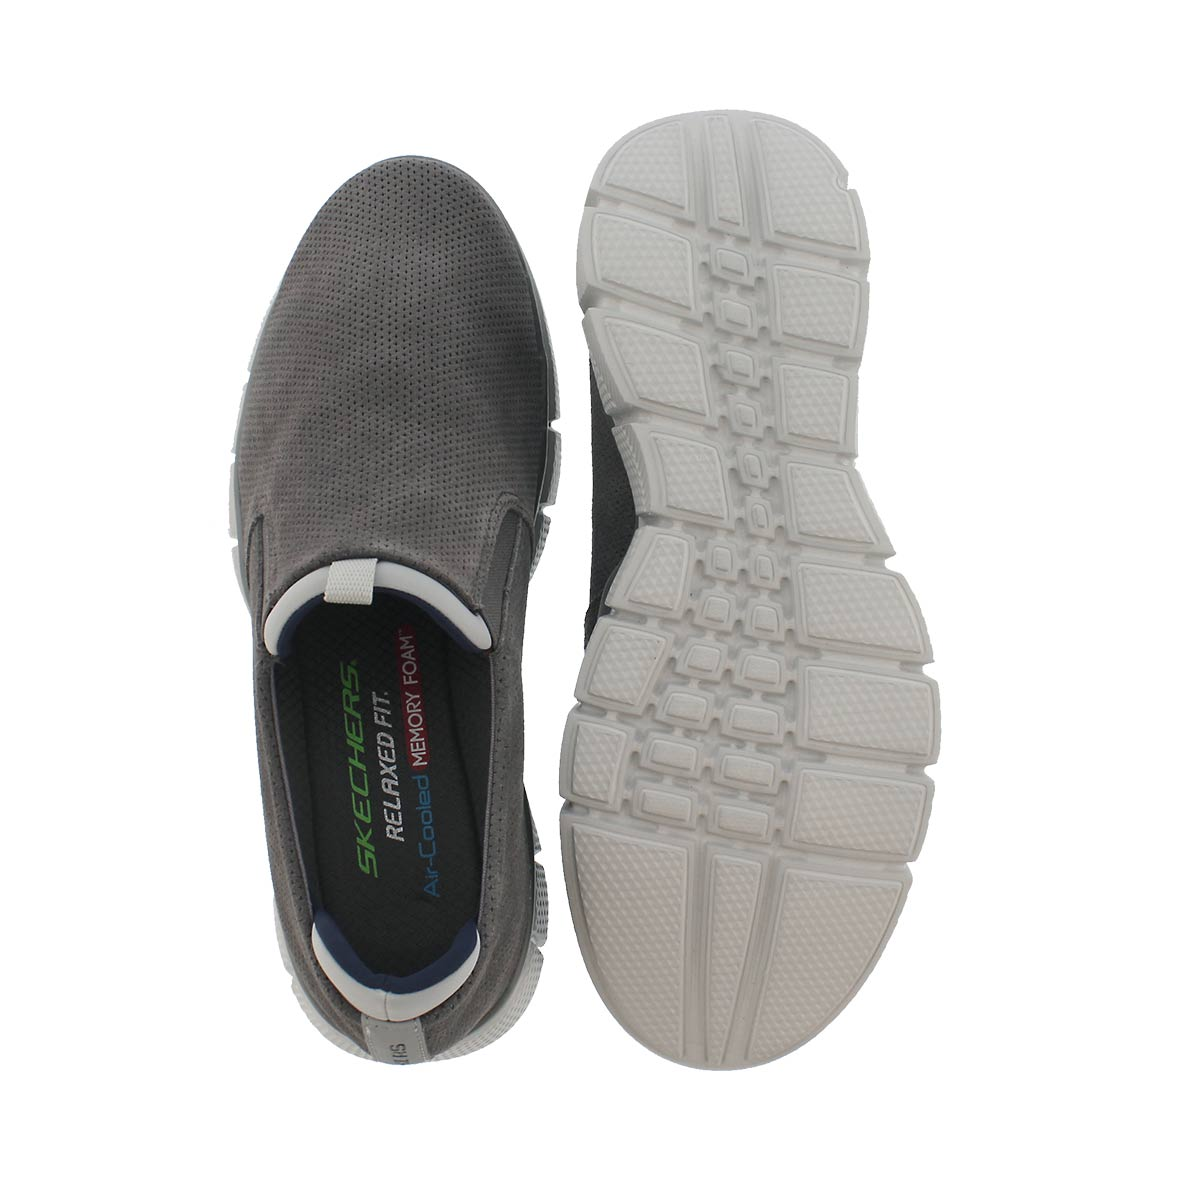 Mns Equalize 2.0 charcoal slip on shoe